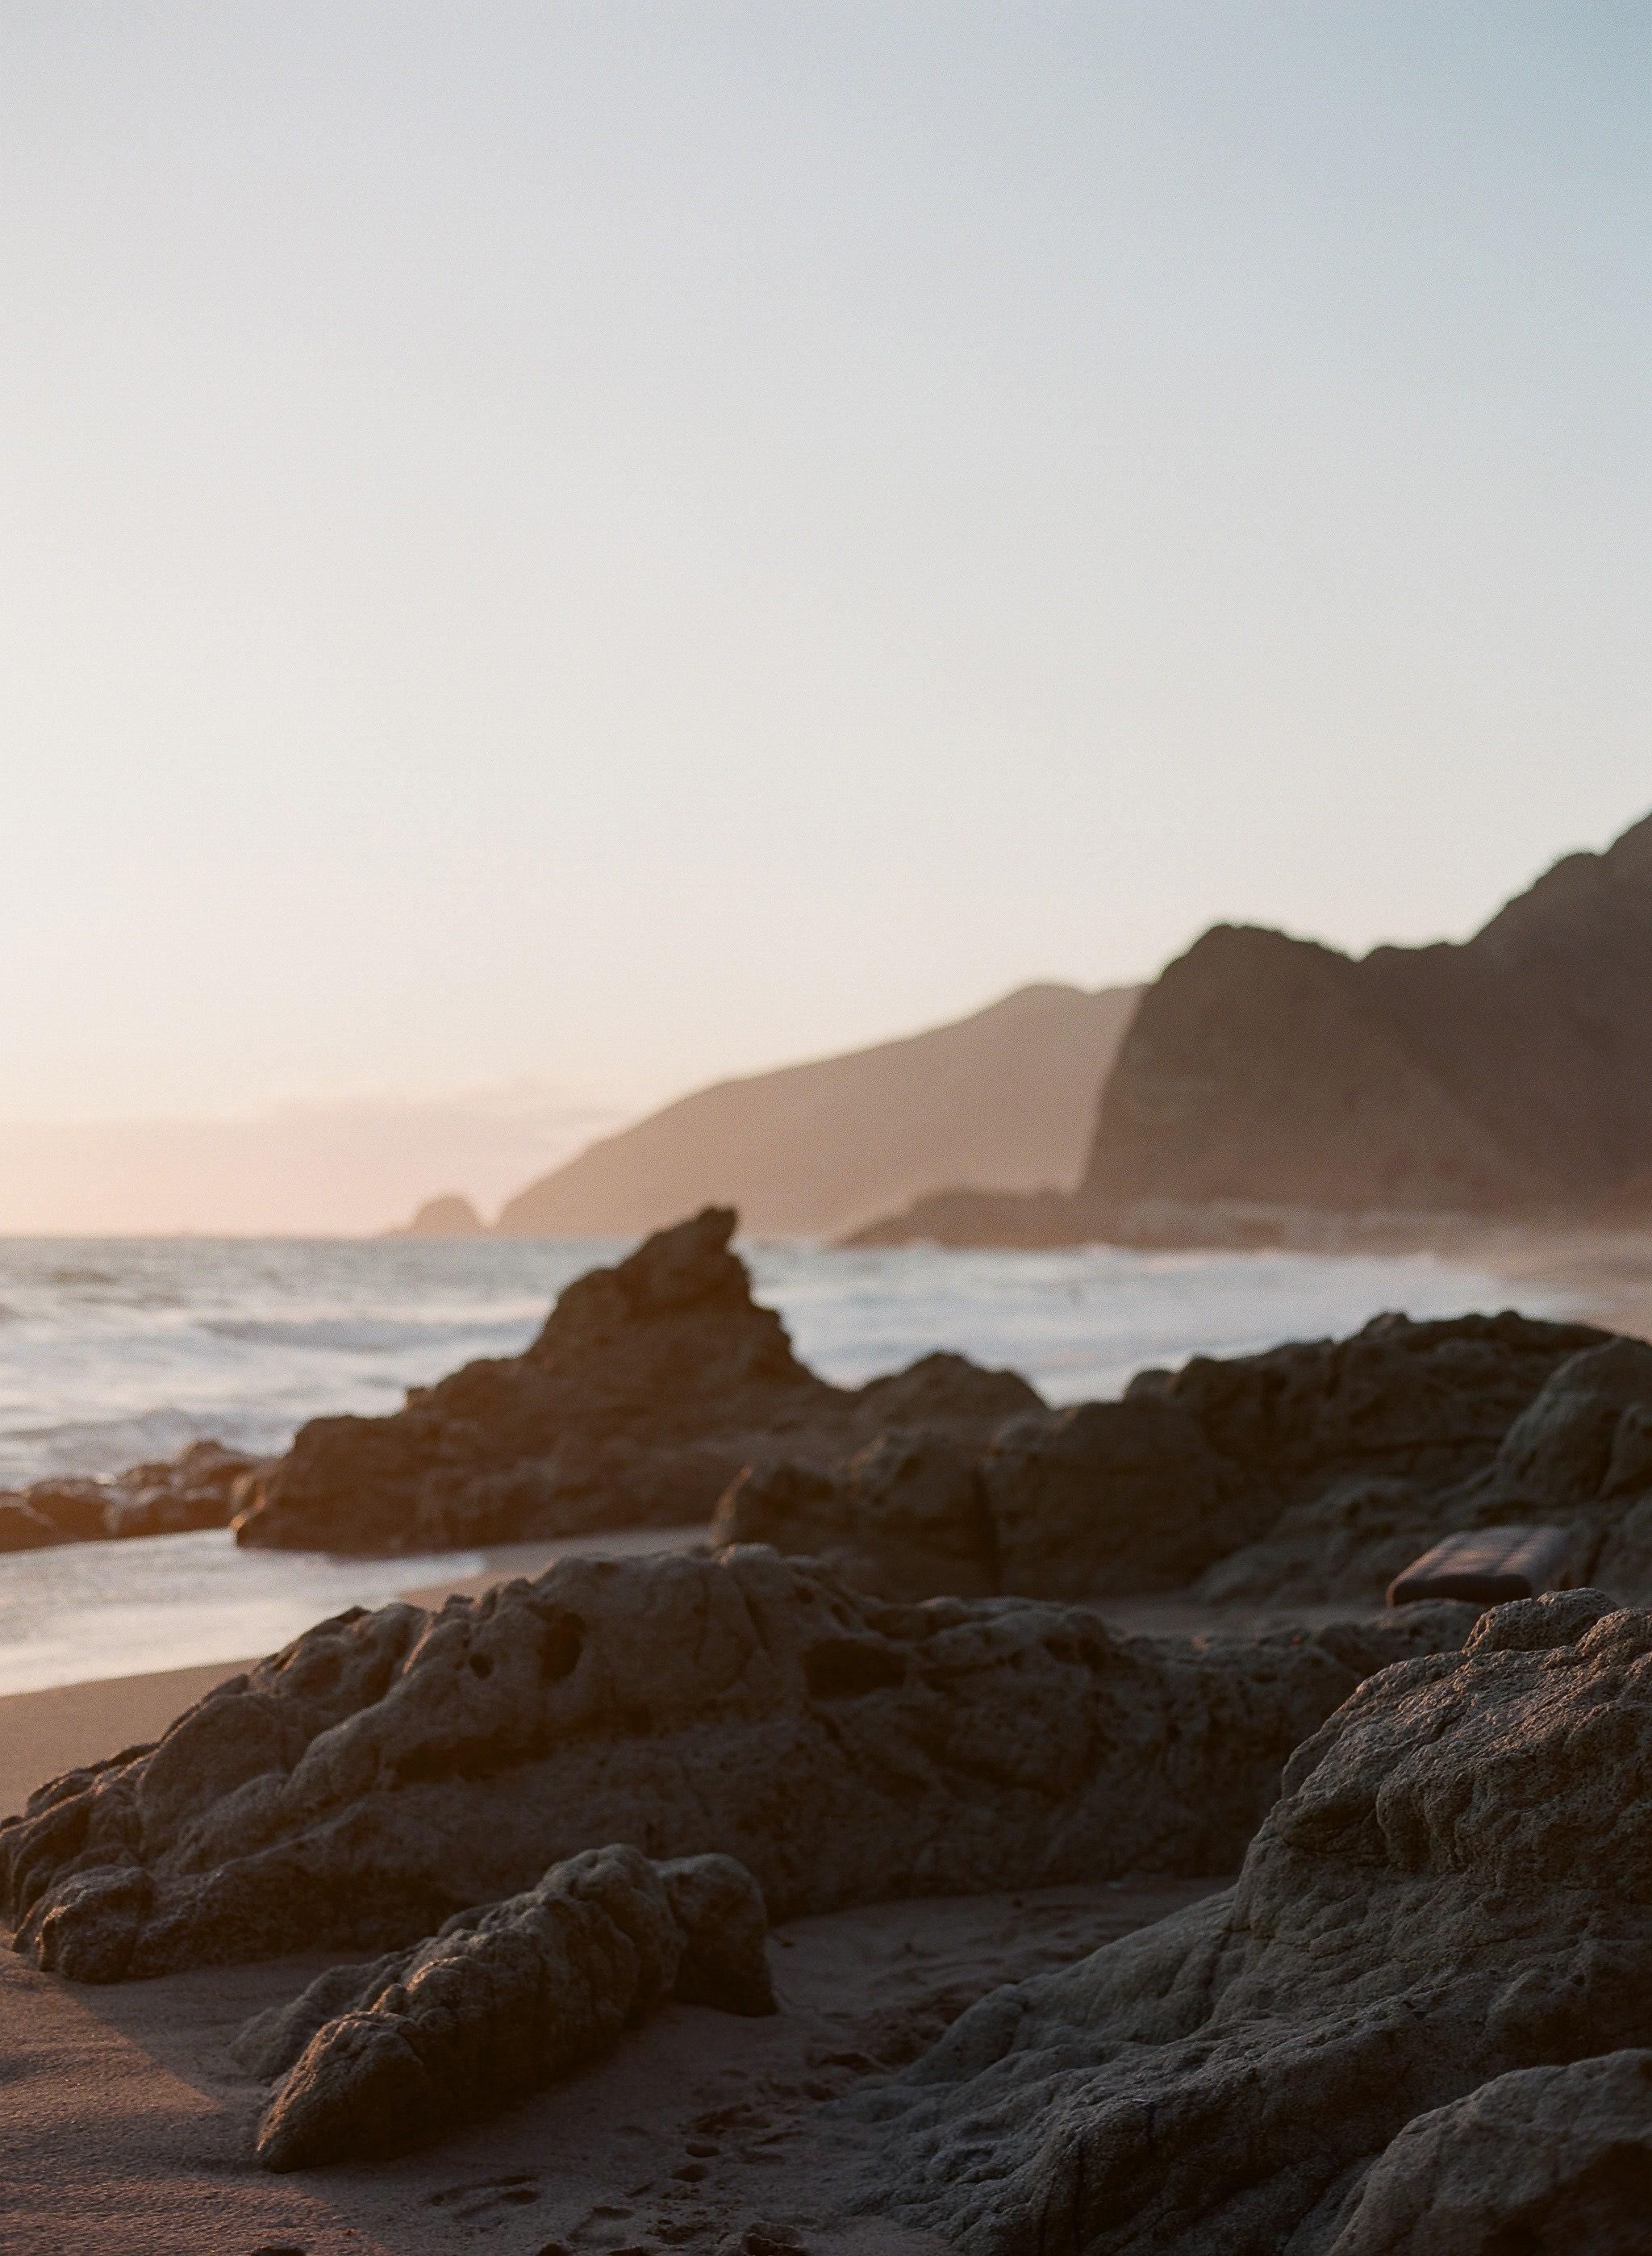 lauramurray-travel-destinationphotography-creativetravel-artists-filmphotography-unearthingtc-malibu-cliffside-ocean-shore.jpg